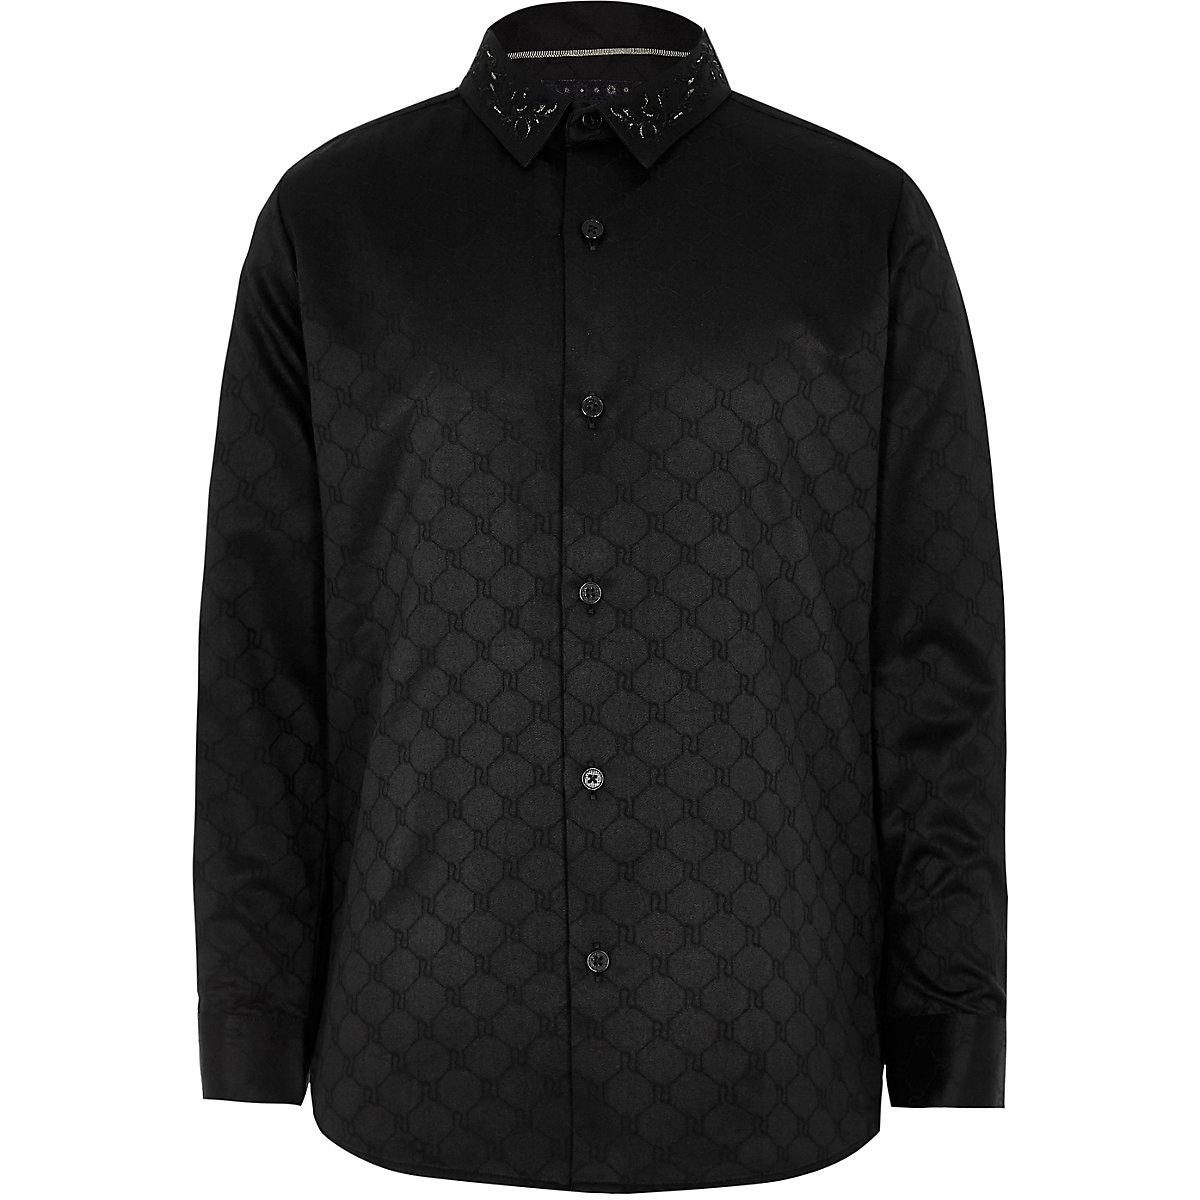 RI 30 boys black jacquard RI shirt